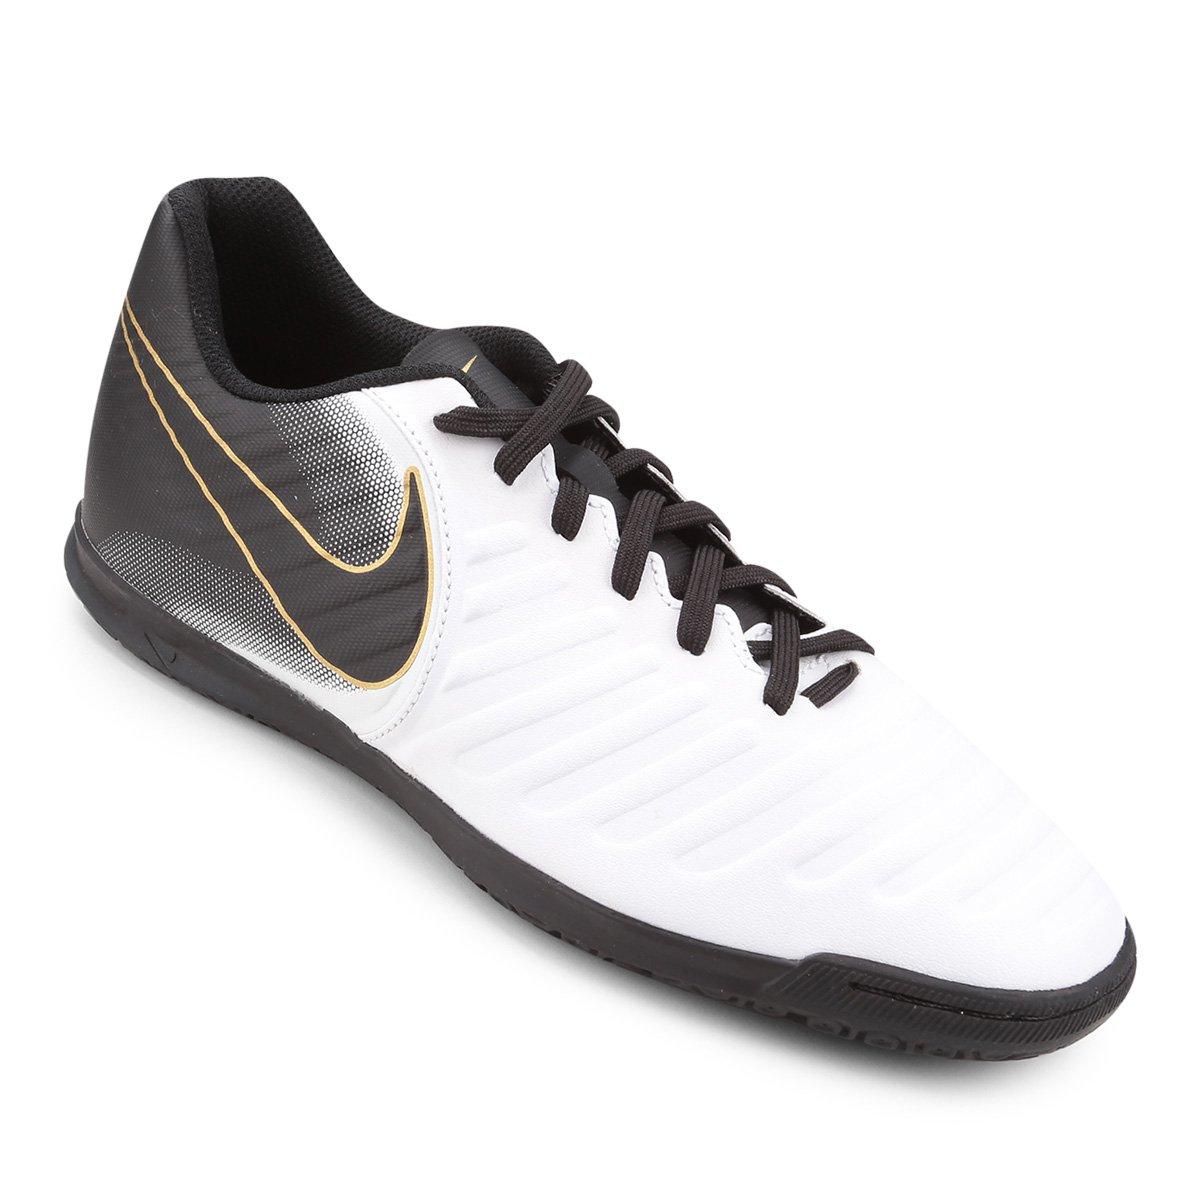 Chuteira Futsal Nike Tiempo Legend 7 Club IC - Branco e Preto - Compre Agora   39b16b020899f